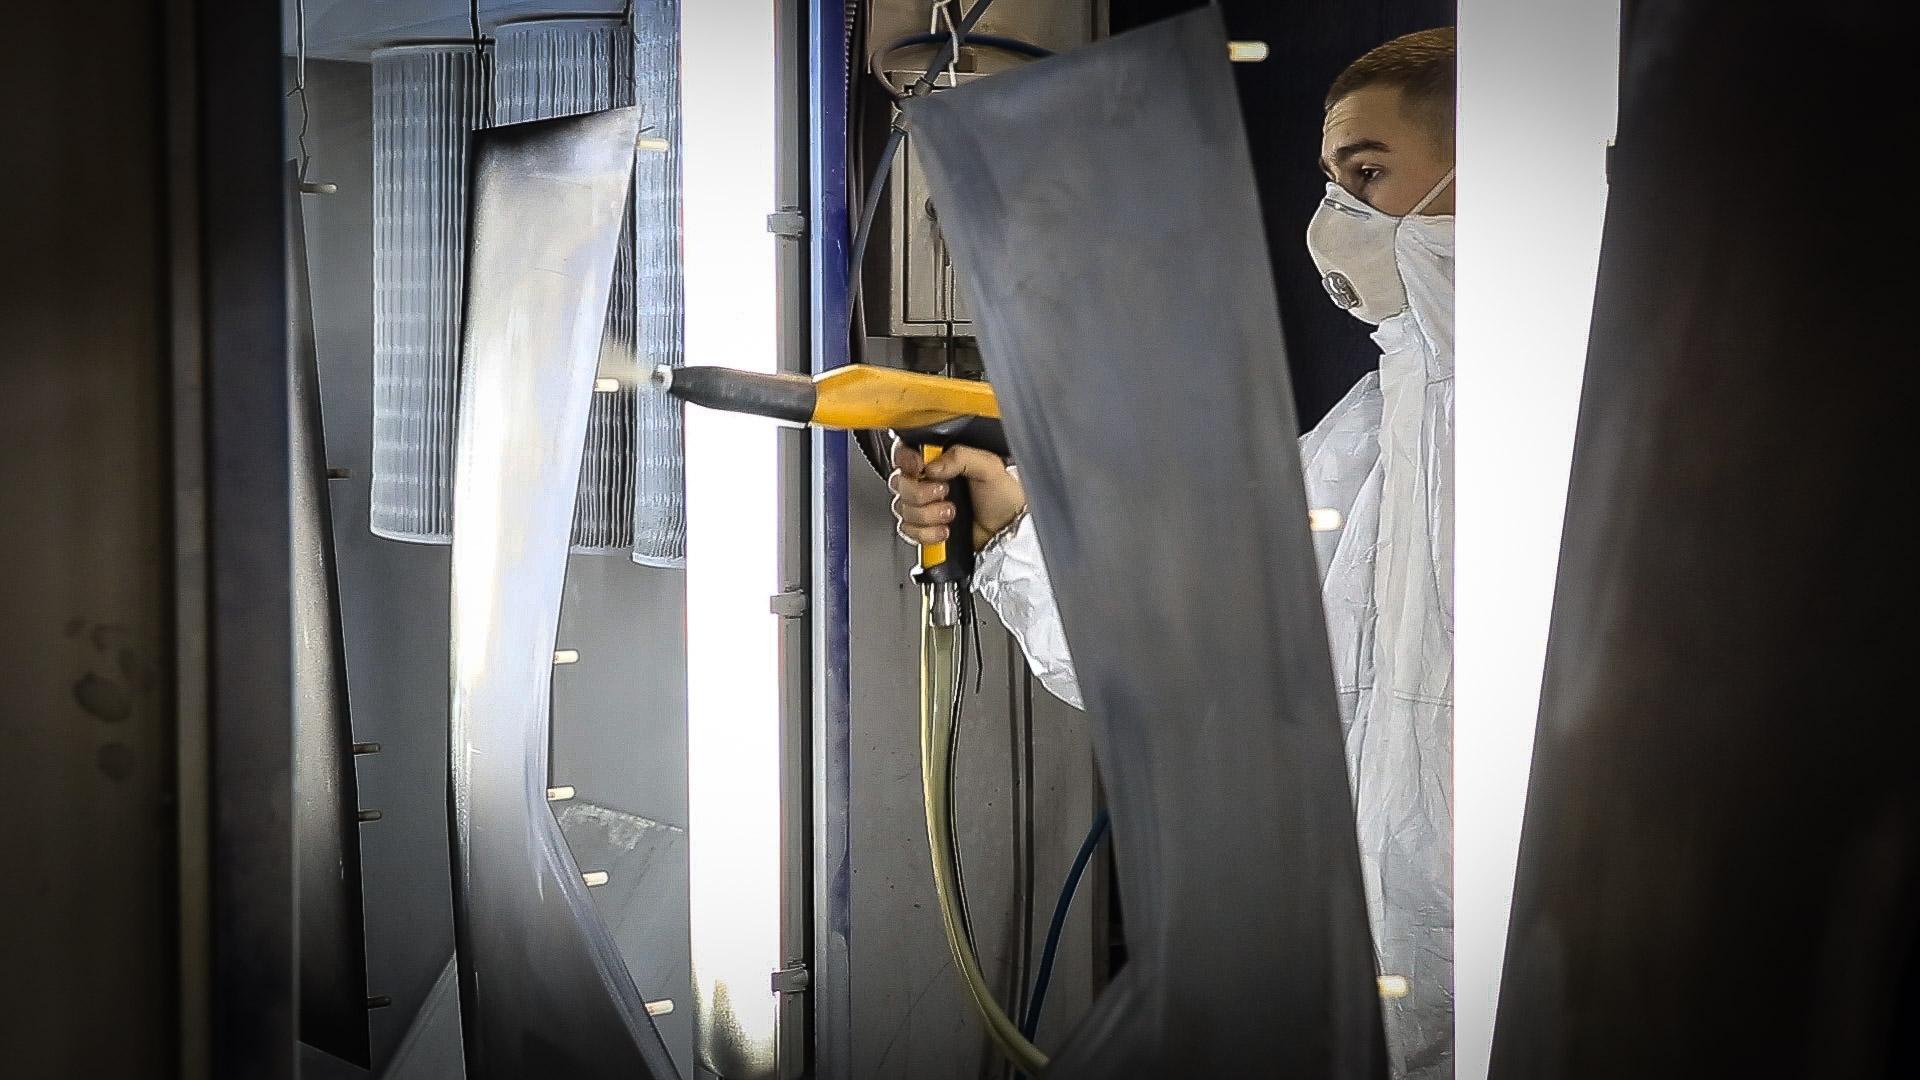 Perfolux metal fabrication, Powder Coating Operations